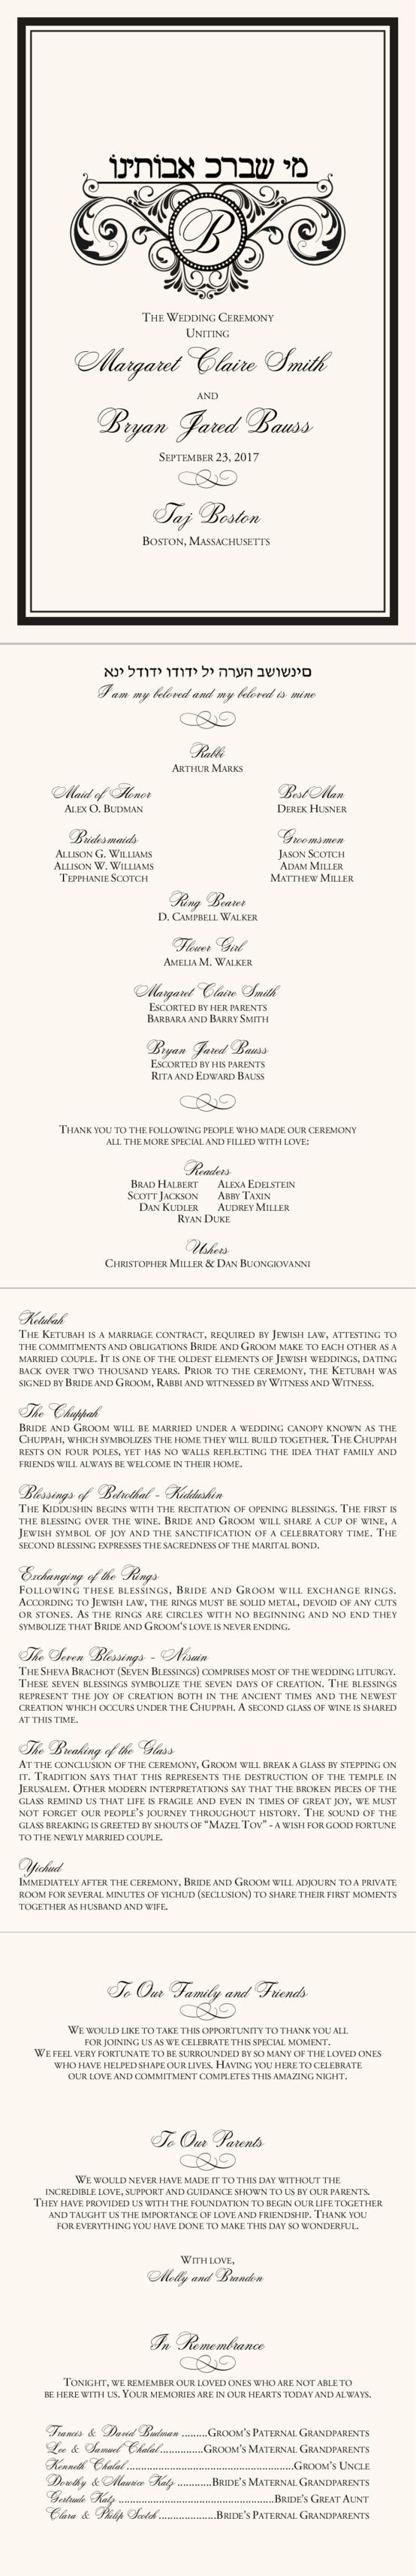 Me She Barach Jewish Wedding Programs Wedding Programs Wedding